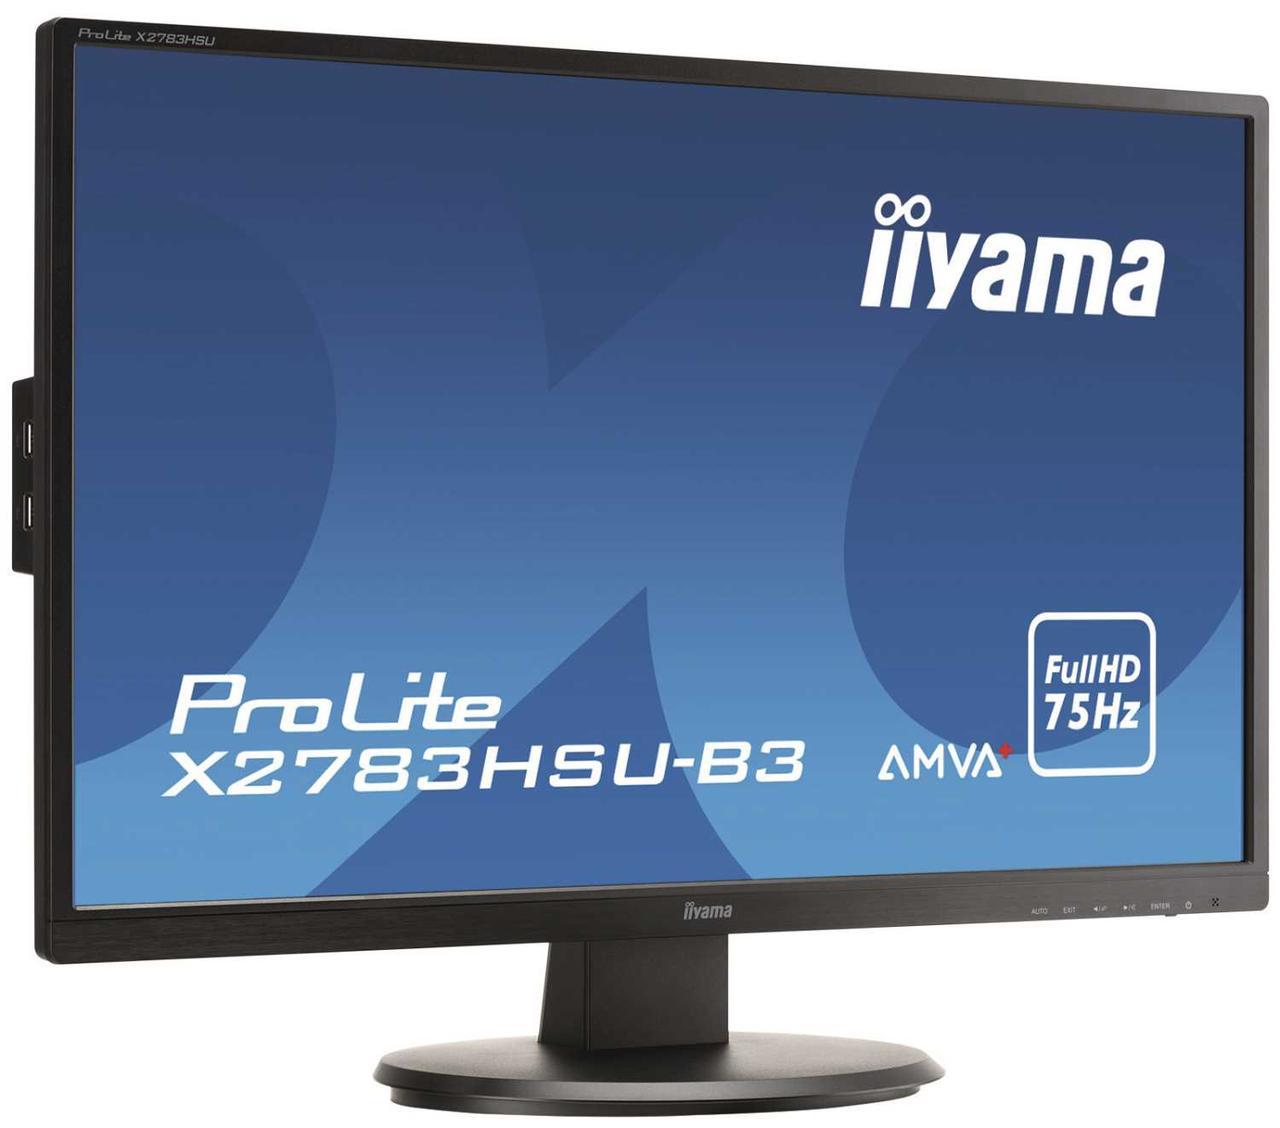 Монитор жидкокристаллический Iiyama Монитор LCD 27'' [16:9] 1920х1080 MVA, nonGLARE, 300cd/m2, H178°/V178°,